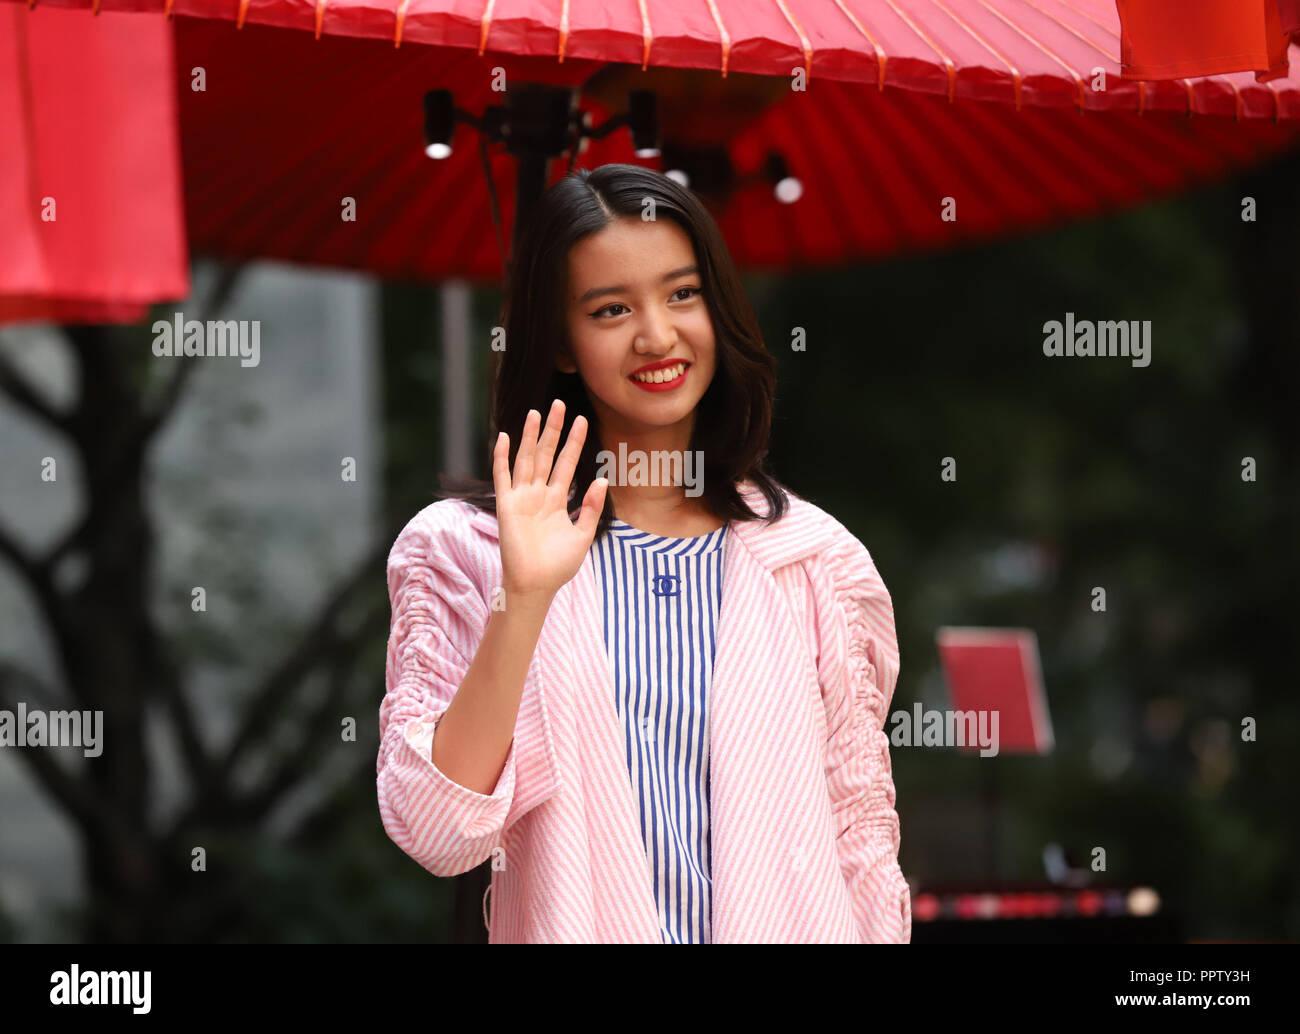 Kimura Takuya / Кимура Такуя / Тимка, Тимочка, Тимон  4 - Страница 6 Tokyo-japan-27th-sep-2019-japanese-model-koki-smiles-as-she-attends-a-press-preview-of-french-fashion-brand-chanels-cosmetics-promotional-event-chanel-matsuri-chanel-festival-at-the-tenso-shrine-in-tokyo-on-thursday-september-27-2018-15-year-old-koki-a-daughter-of-japanese-actor-takuya-kimura-and-singer-shizuka-kudo-became-chanels-beauty-ambassador-this-month-credit-yoshio-tsunodaafloalamy-live-news-PPTY3H